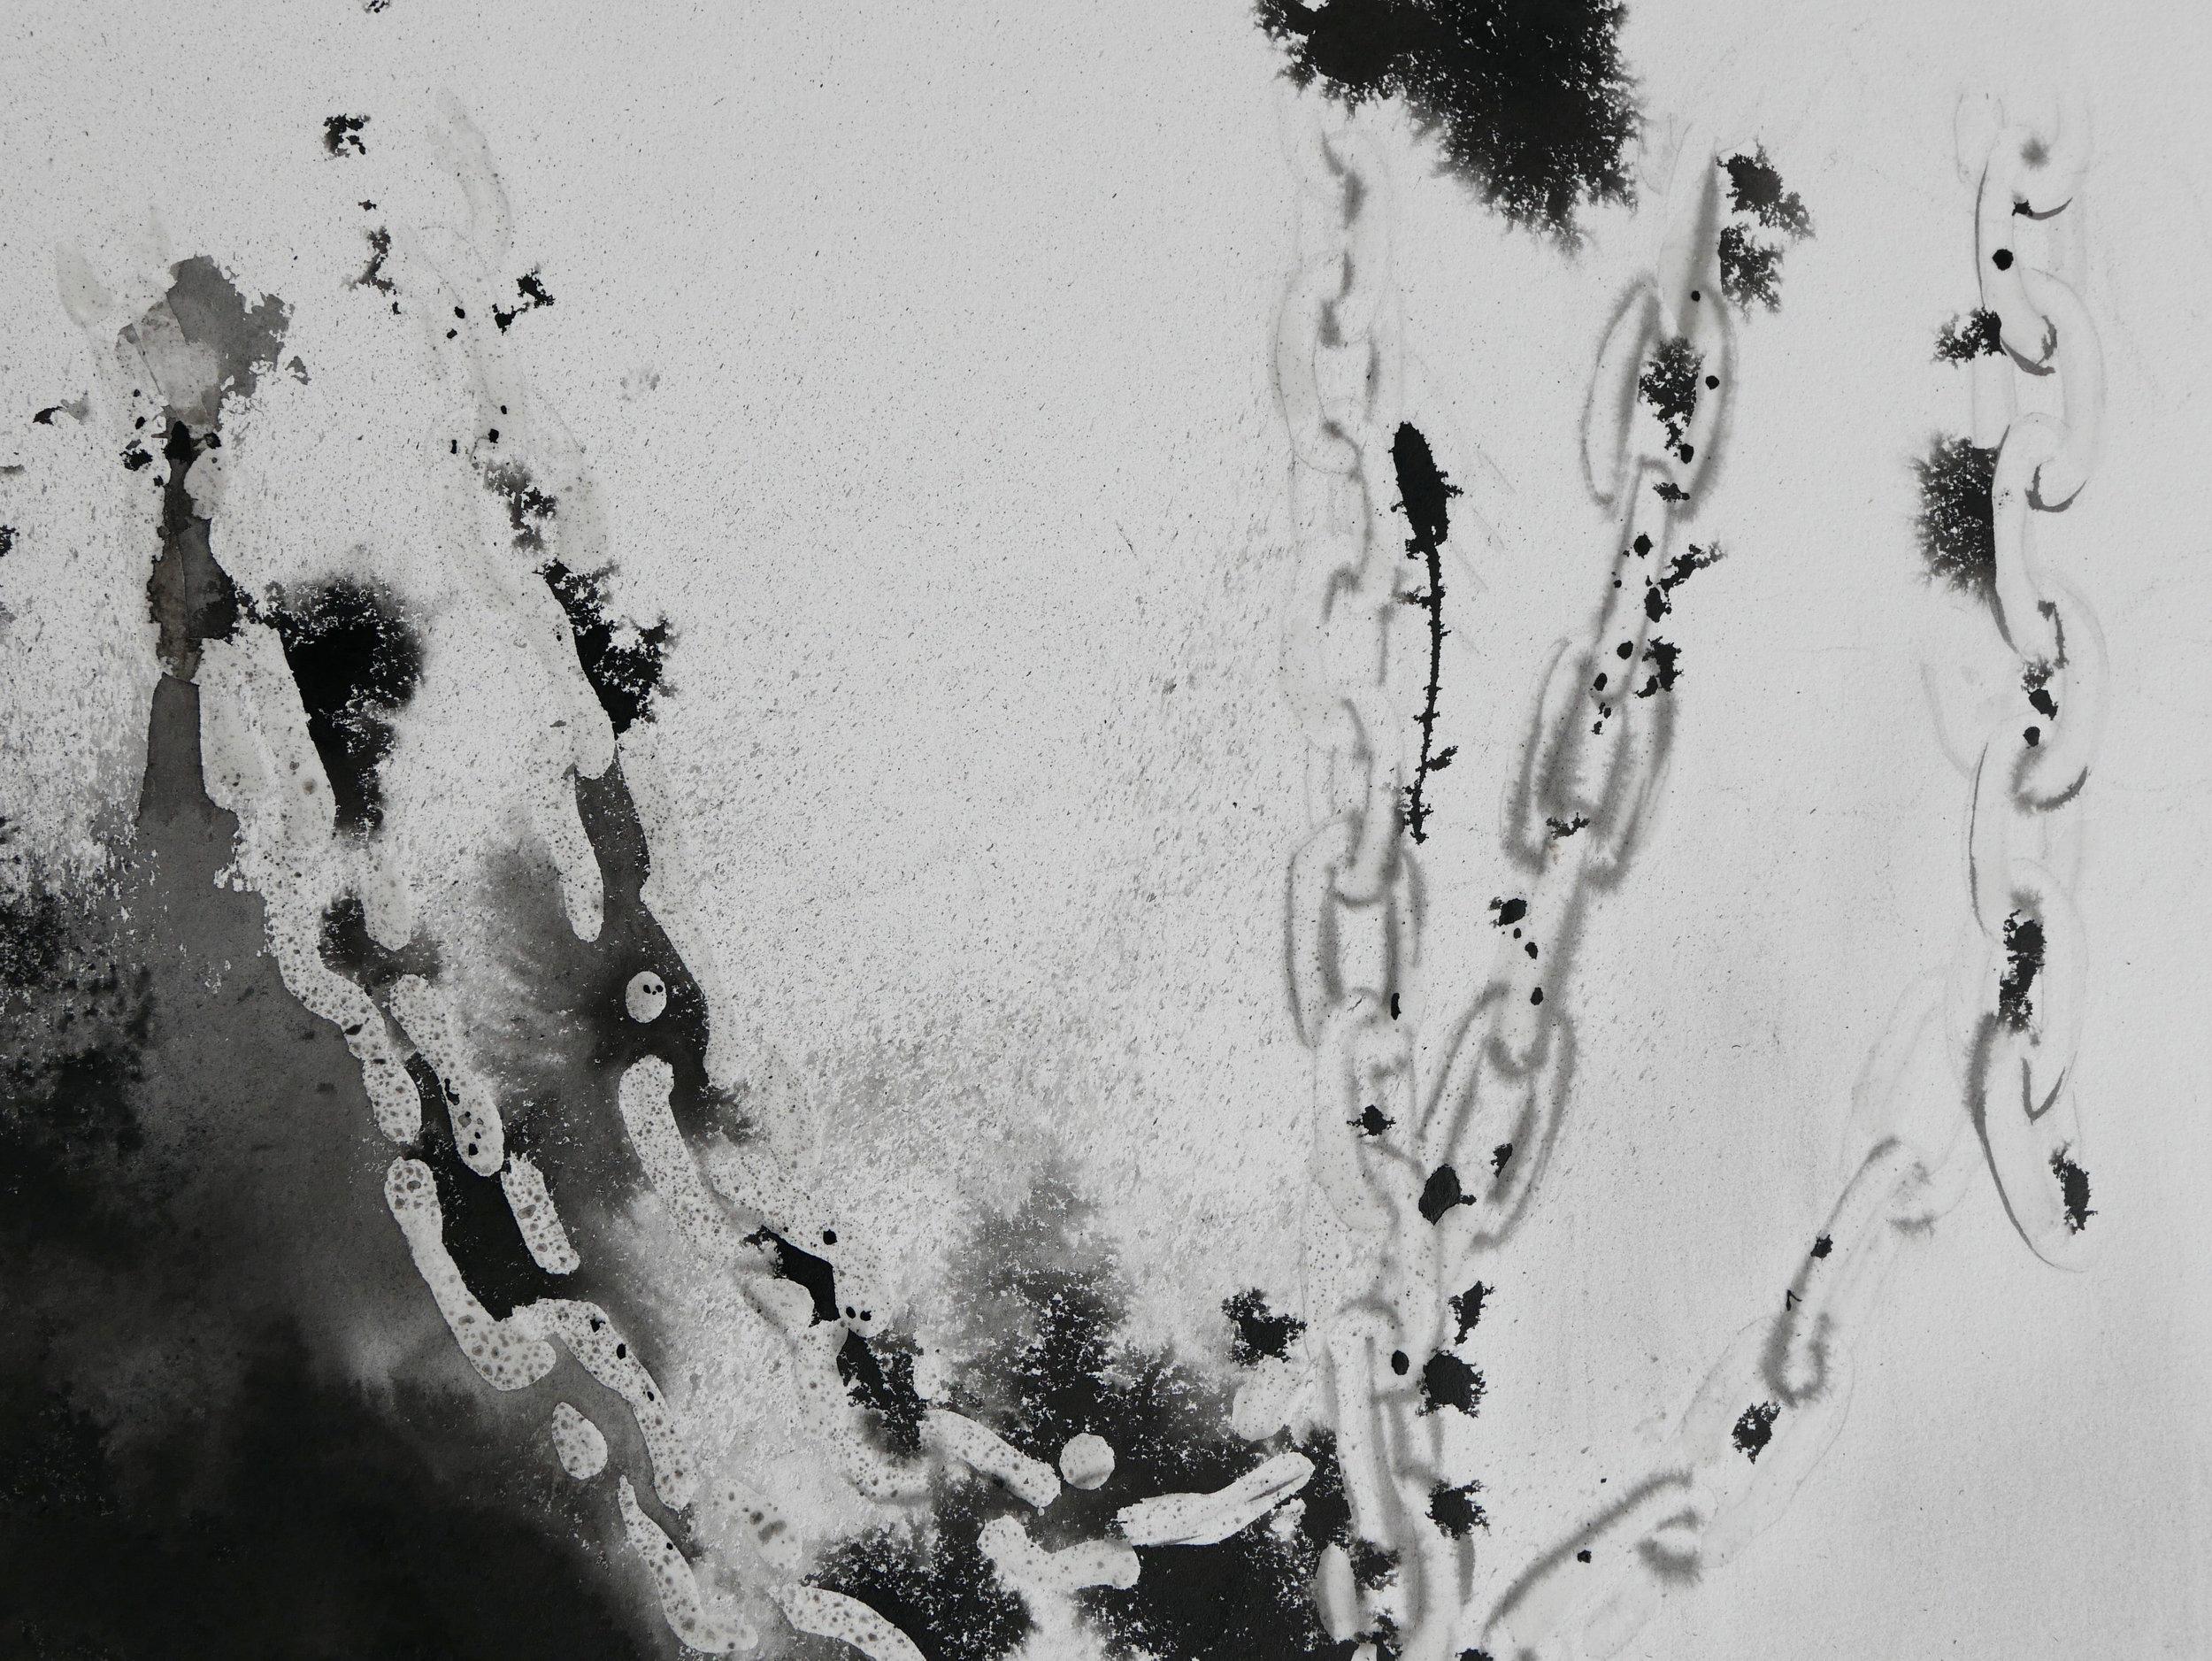 Detail The ICEman Cometh, 2018